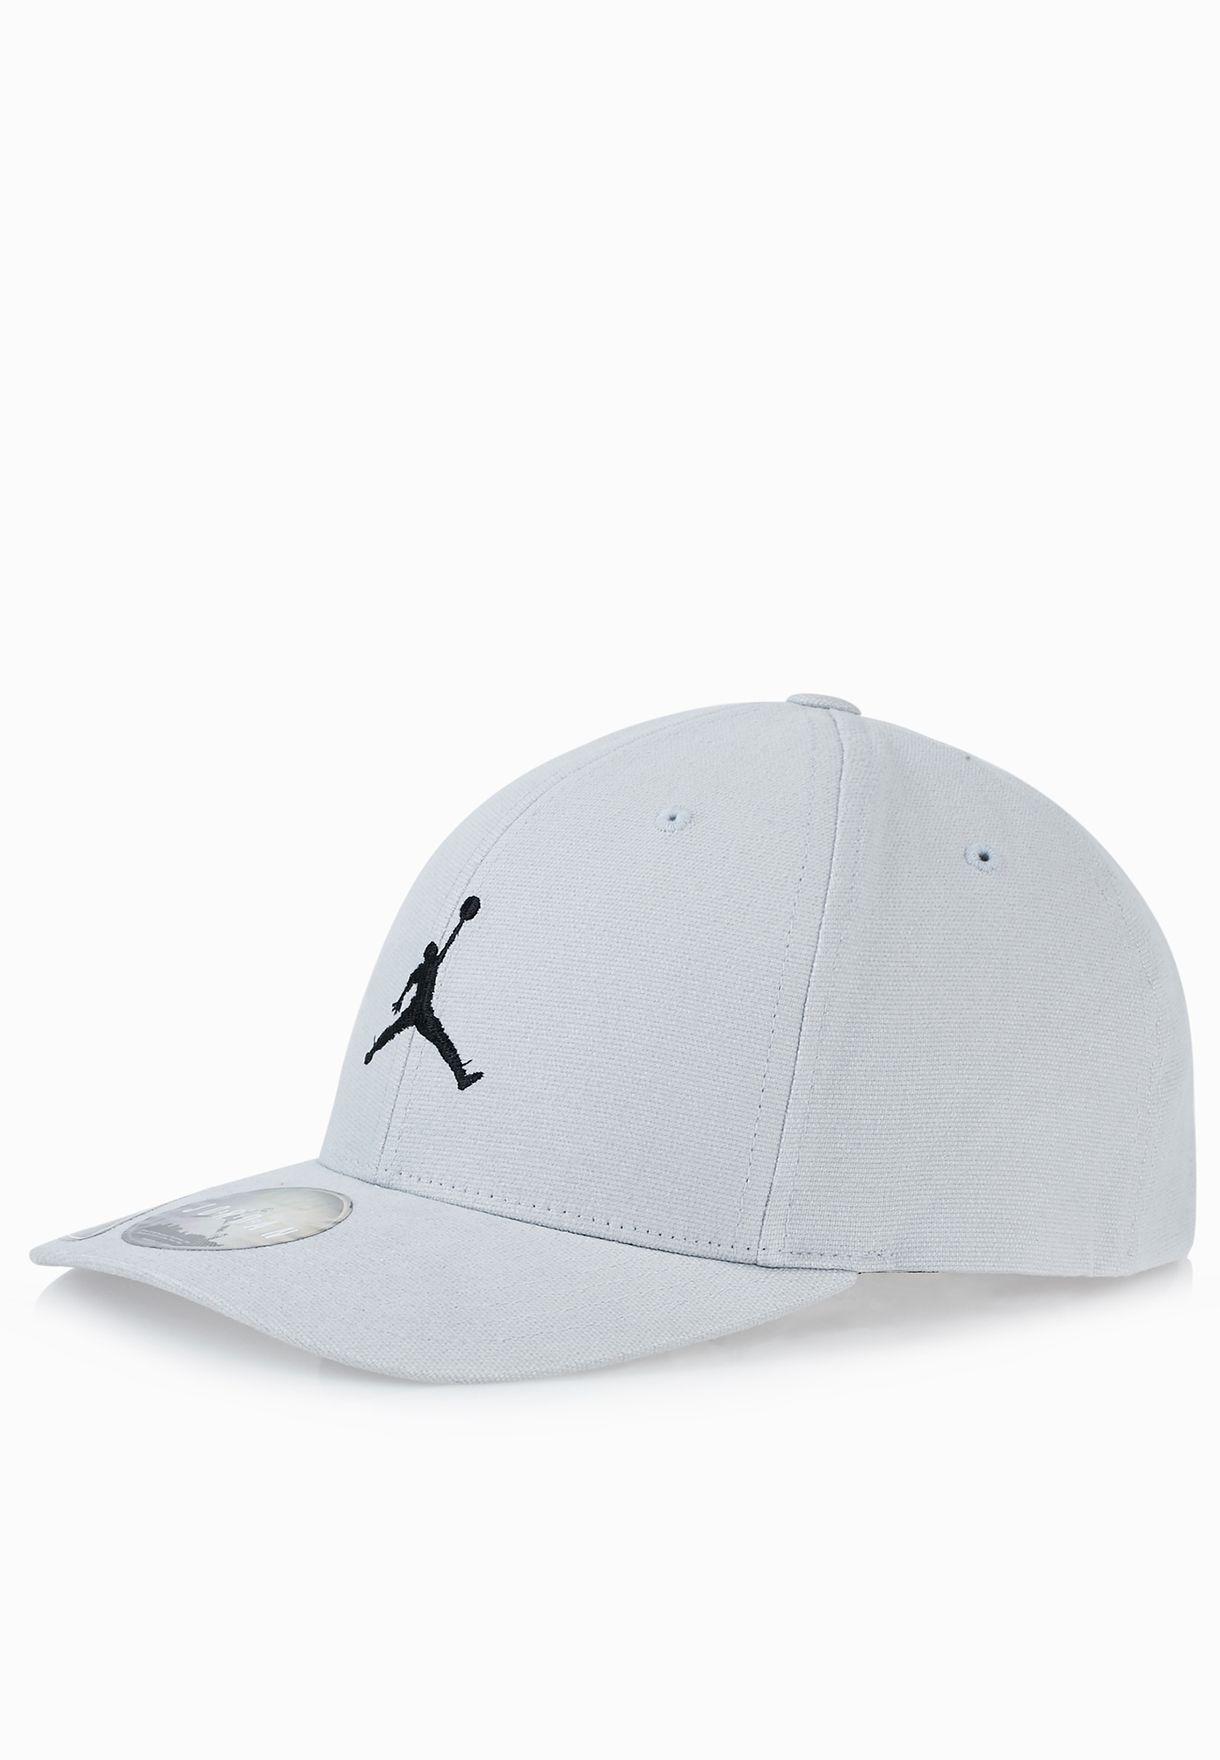 7529a9b4e78 Shop Nike grey Jordan Flex Fit Cap 606365-015 for Men in UAE ...